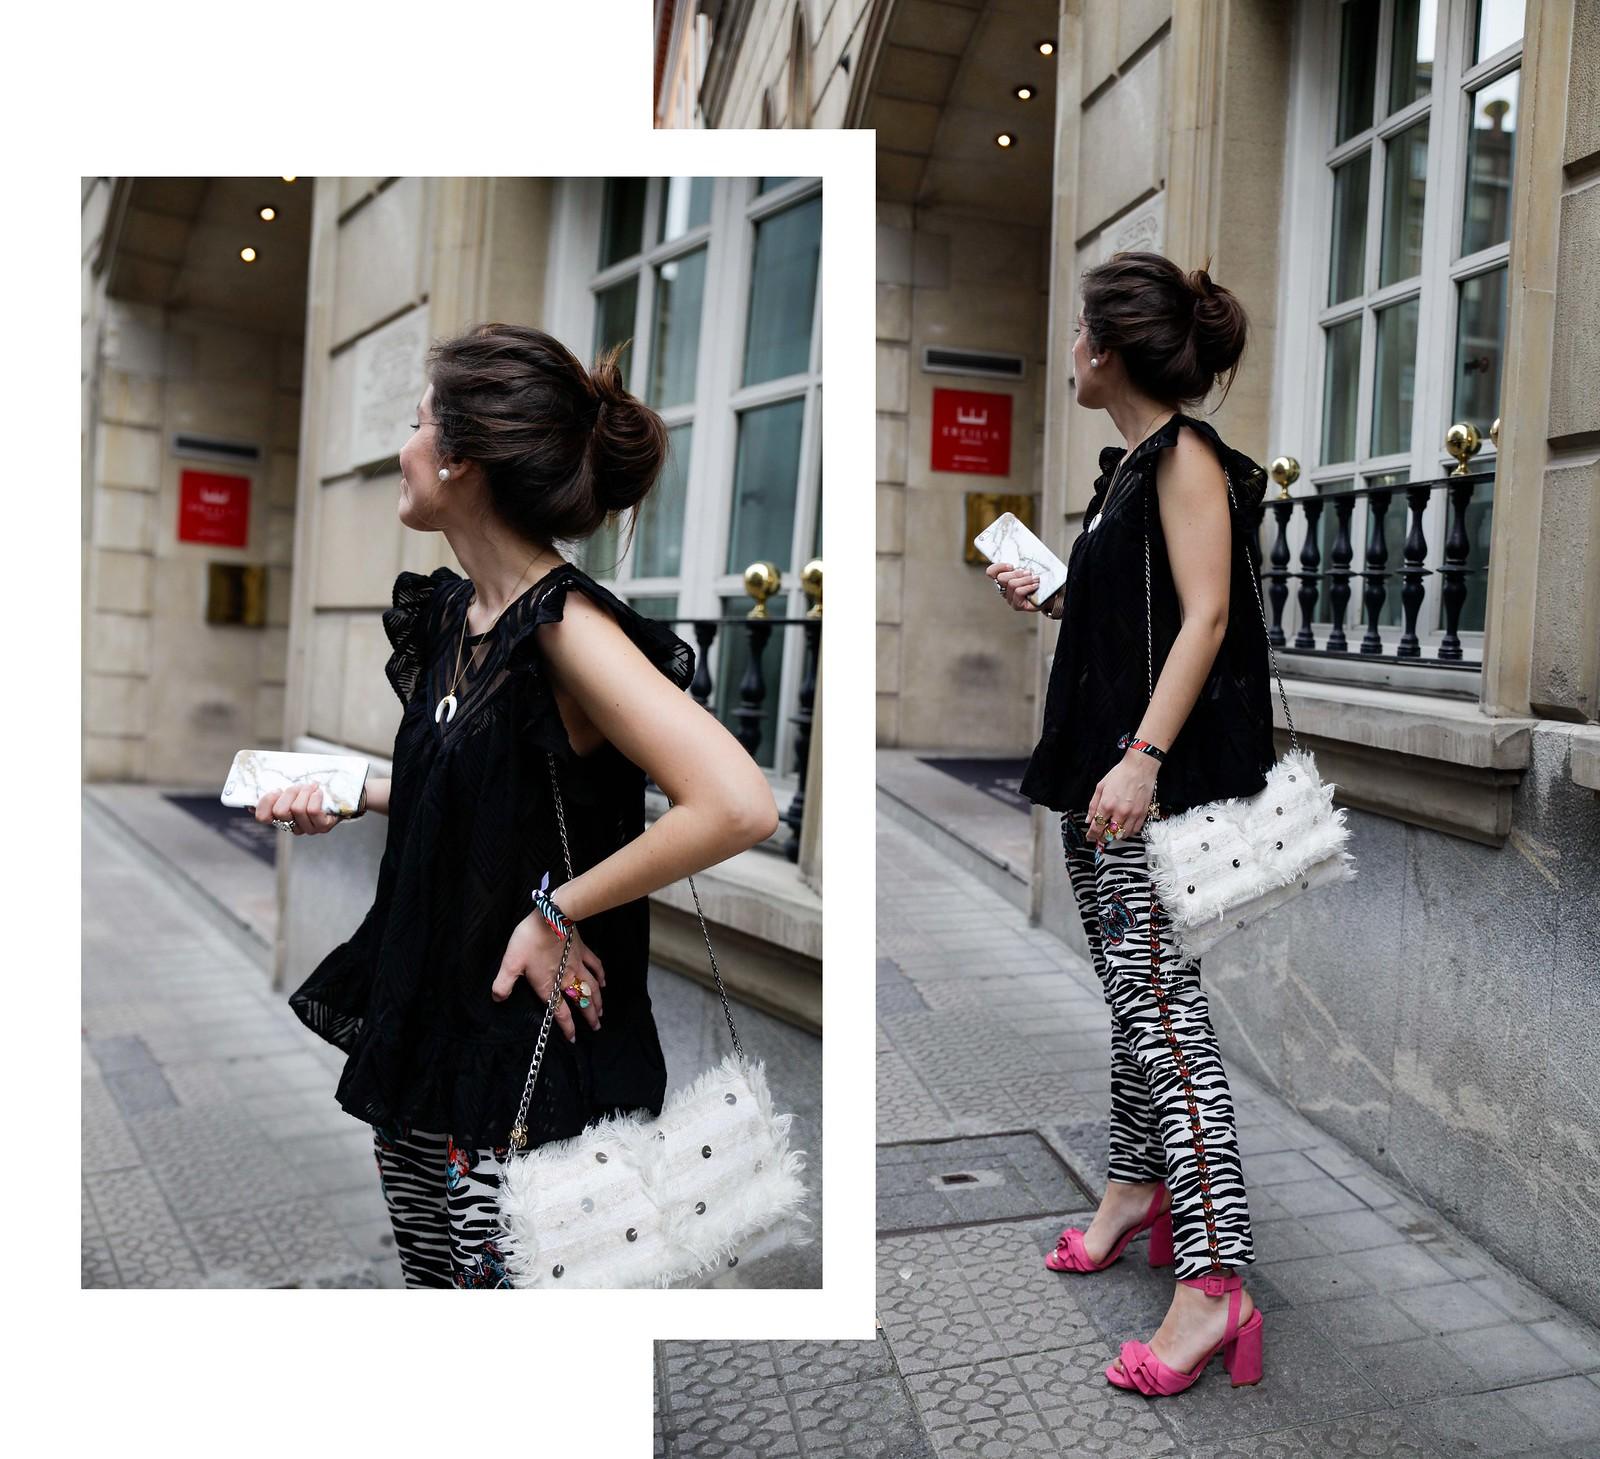 02_Pantalones_Zebra_Blusa_Boho_tacones_rosas_stradivarius_Theguestgirl_outfit_barcelona_streetstyle